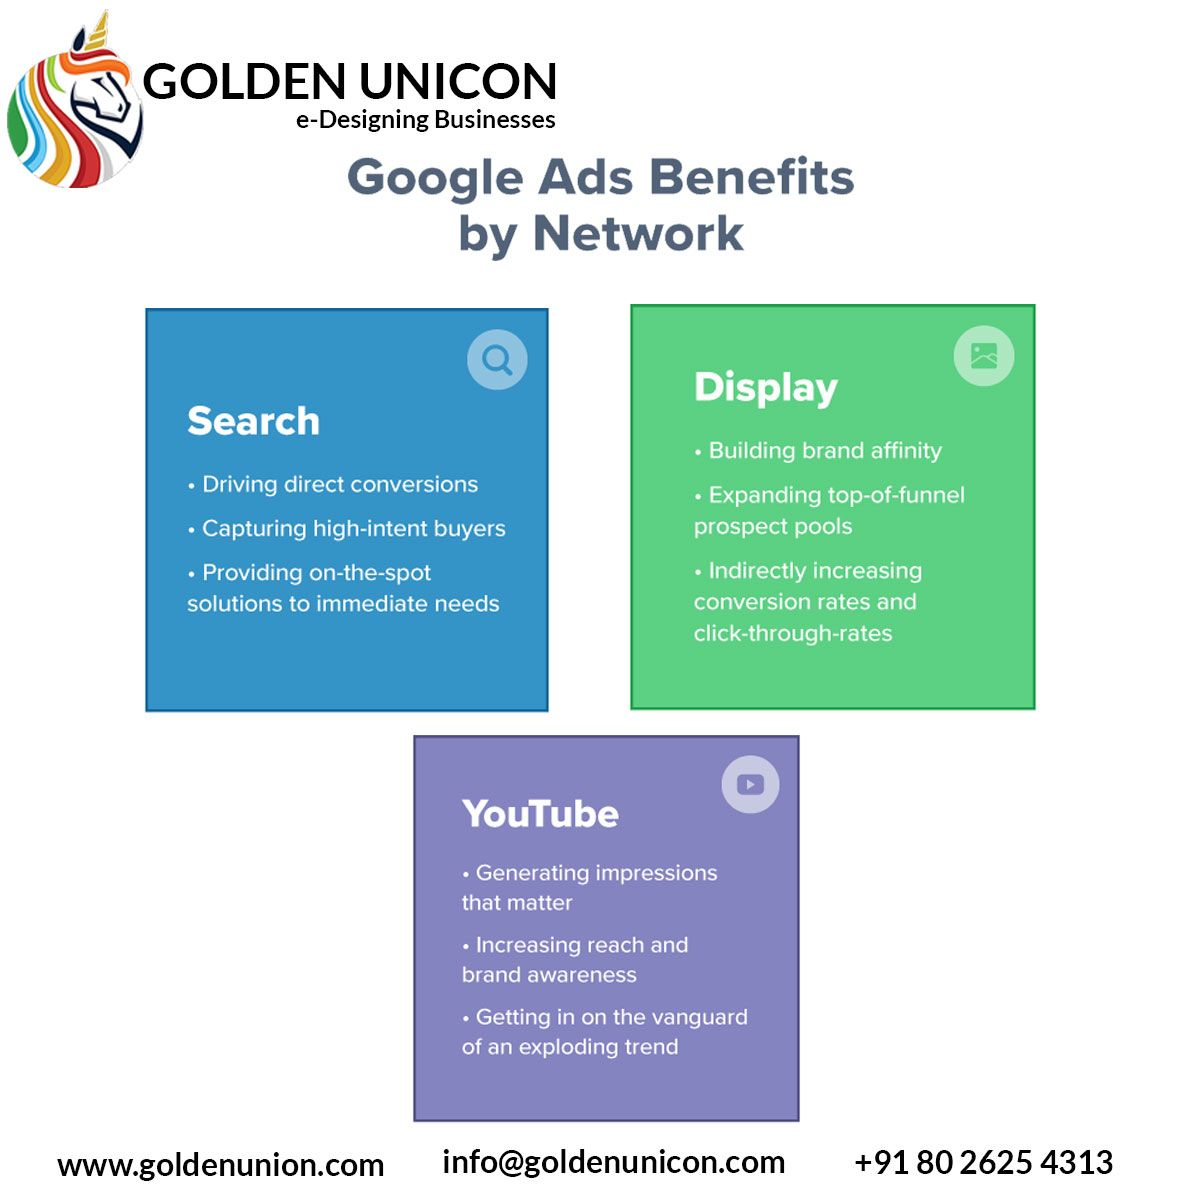 Google Ads Benefits Digital Marketing Google Ads Web Marketing